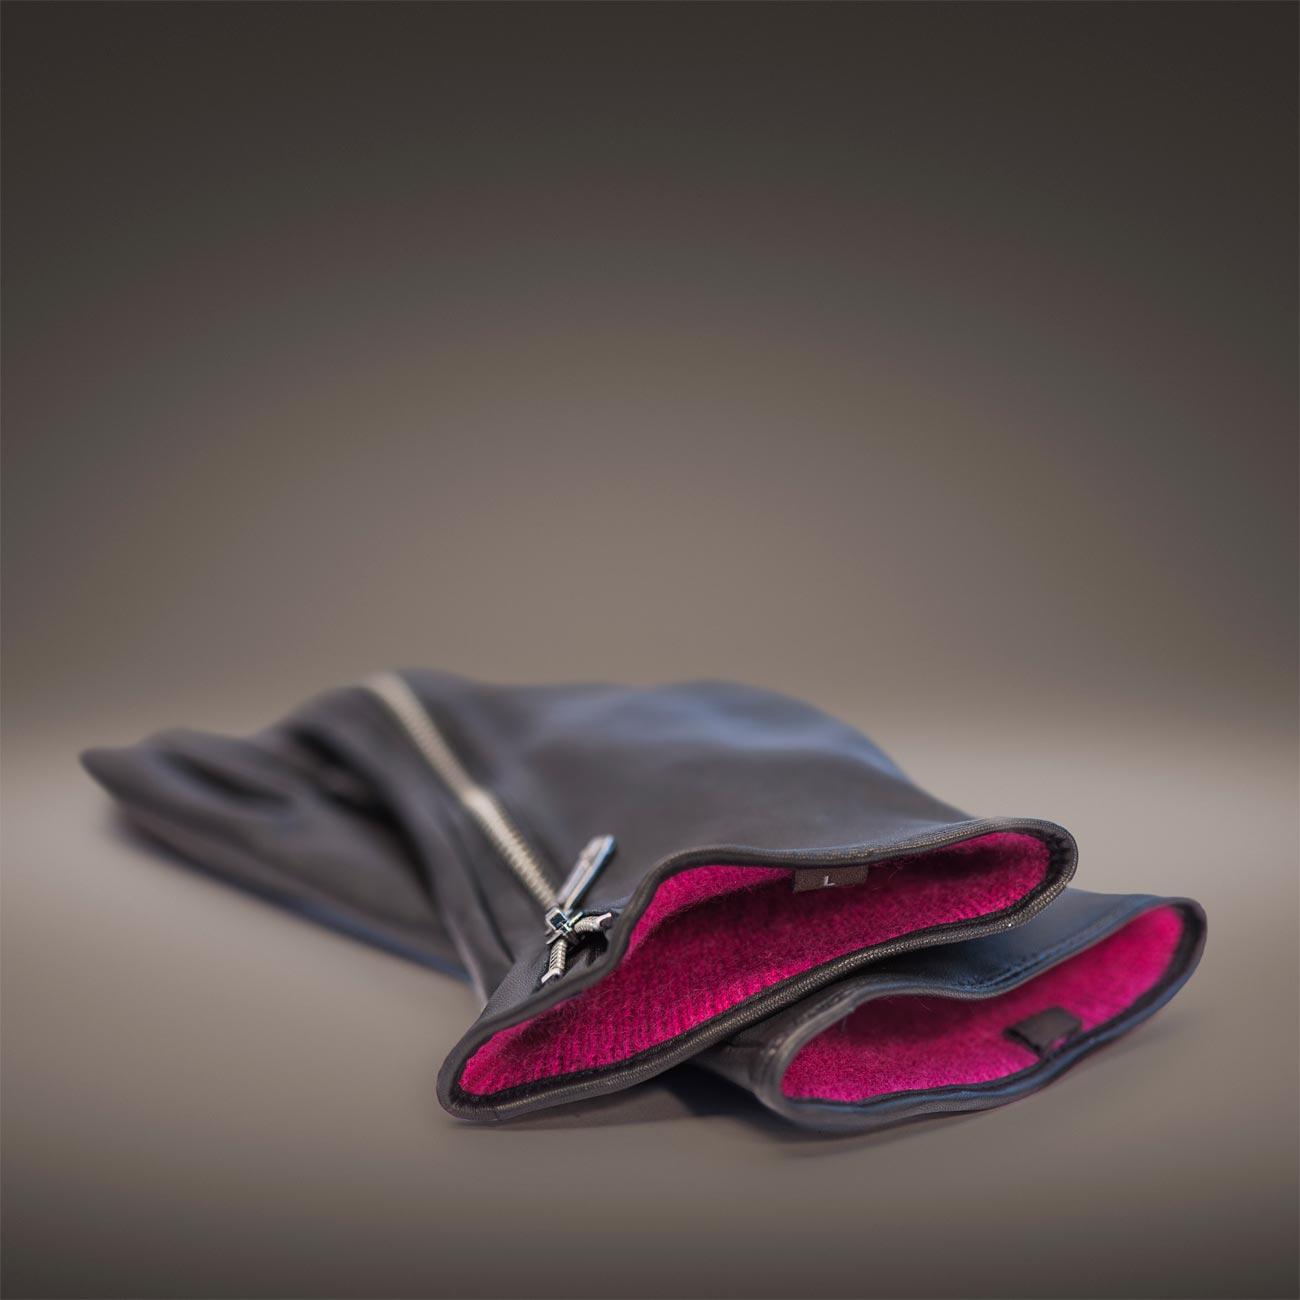 Produzent hochwertige Handschuhe | Hersteller hochwertiger Handschuhe